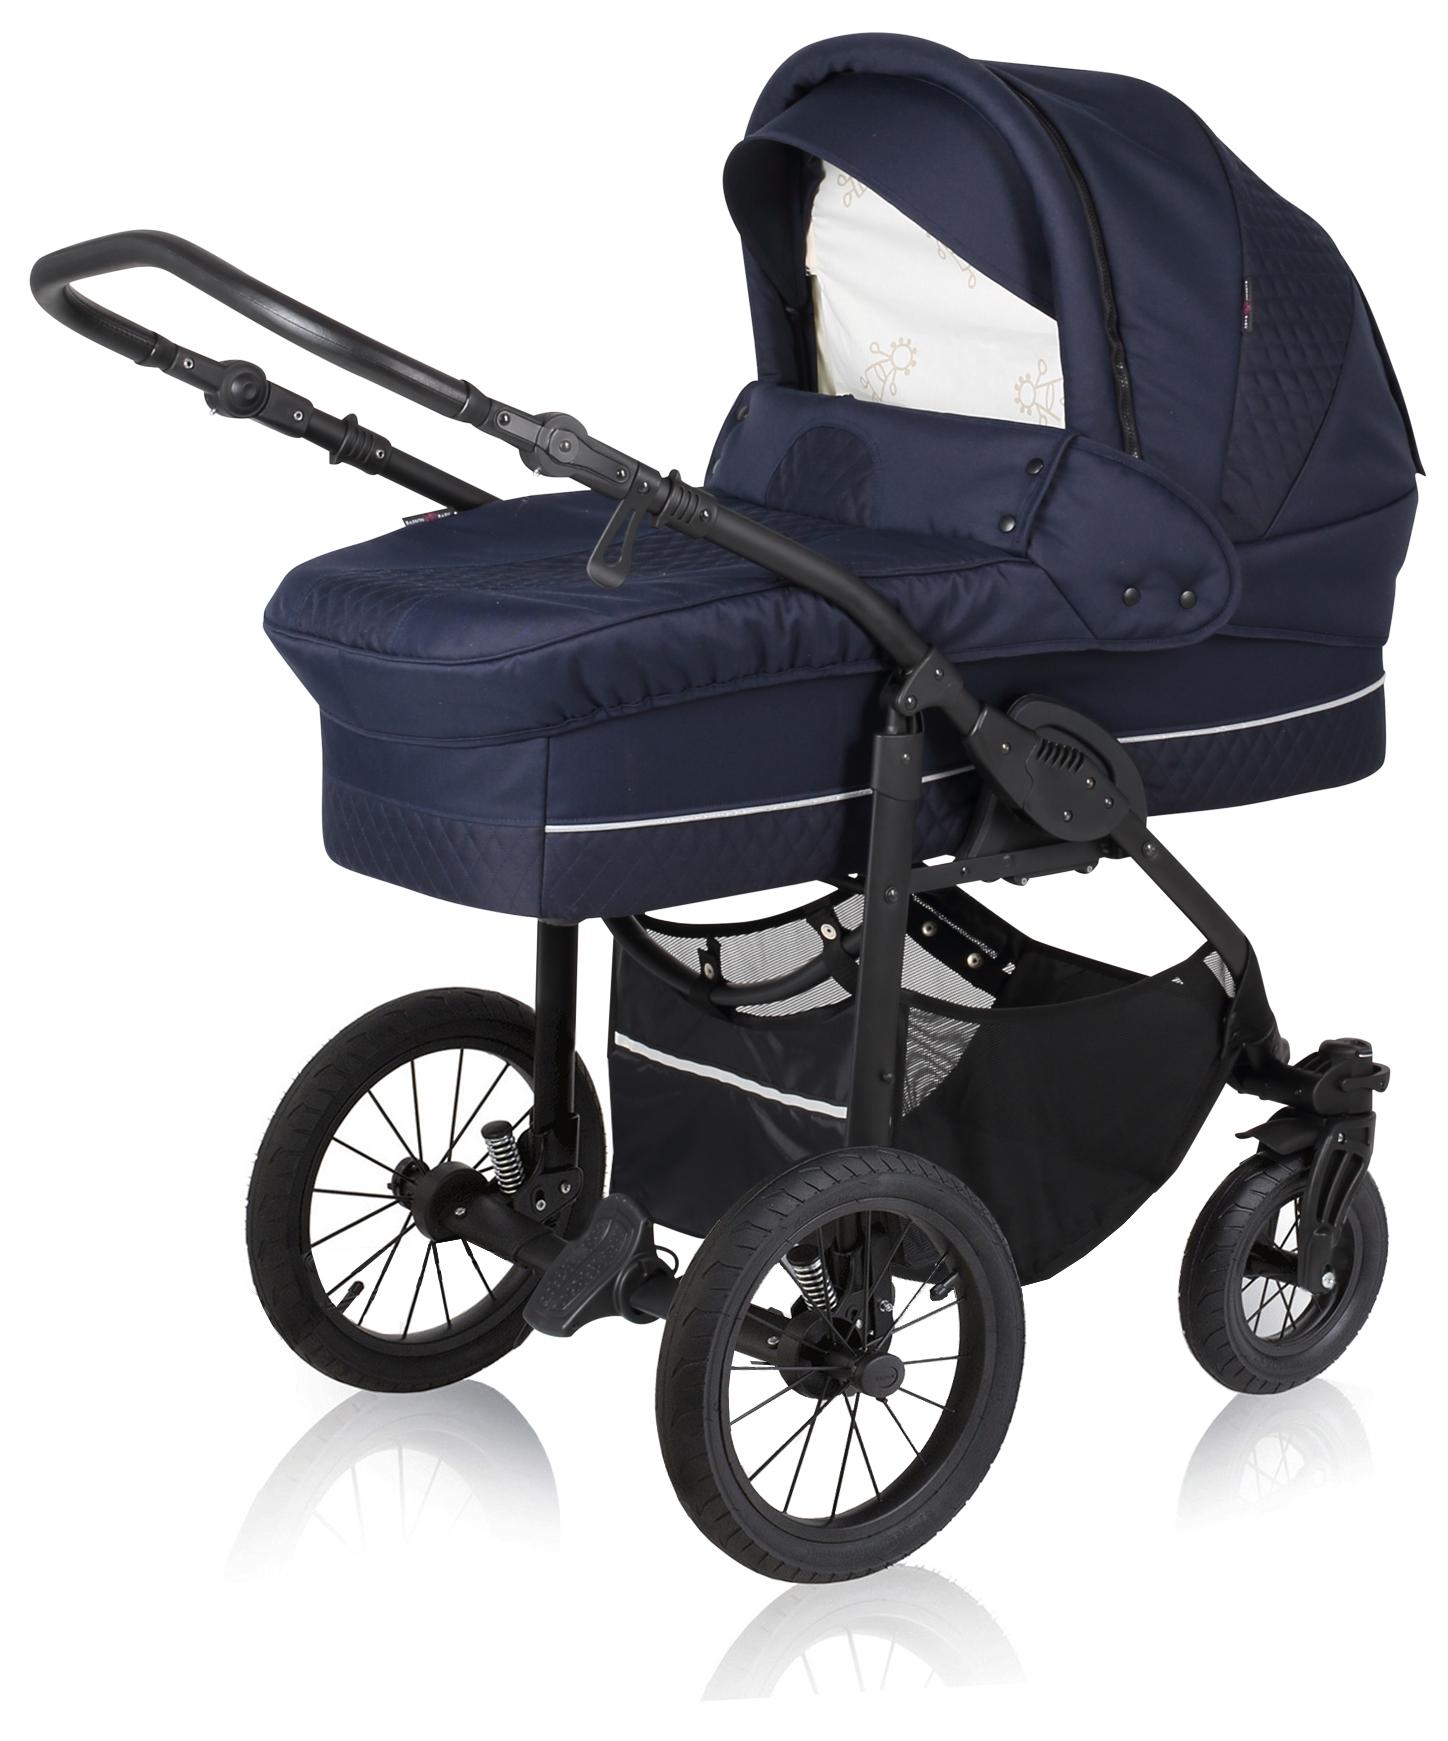 basson baby nordic lux kinderwagen marineblau nordic lux basson baby kinderwagen. Black Bedroom Furniture Sets. Home Design Ideas